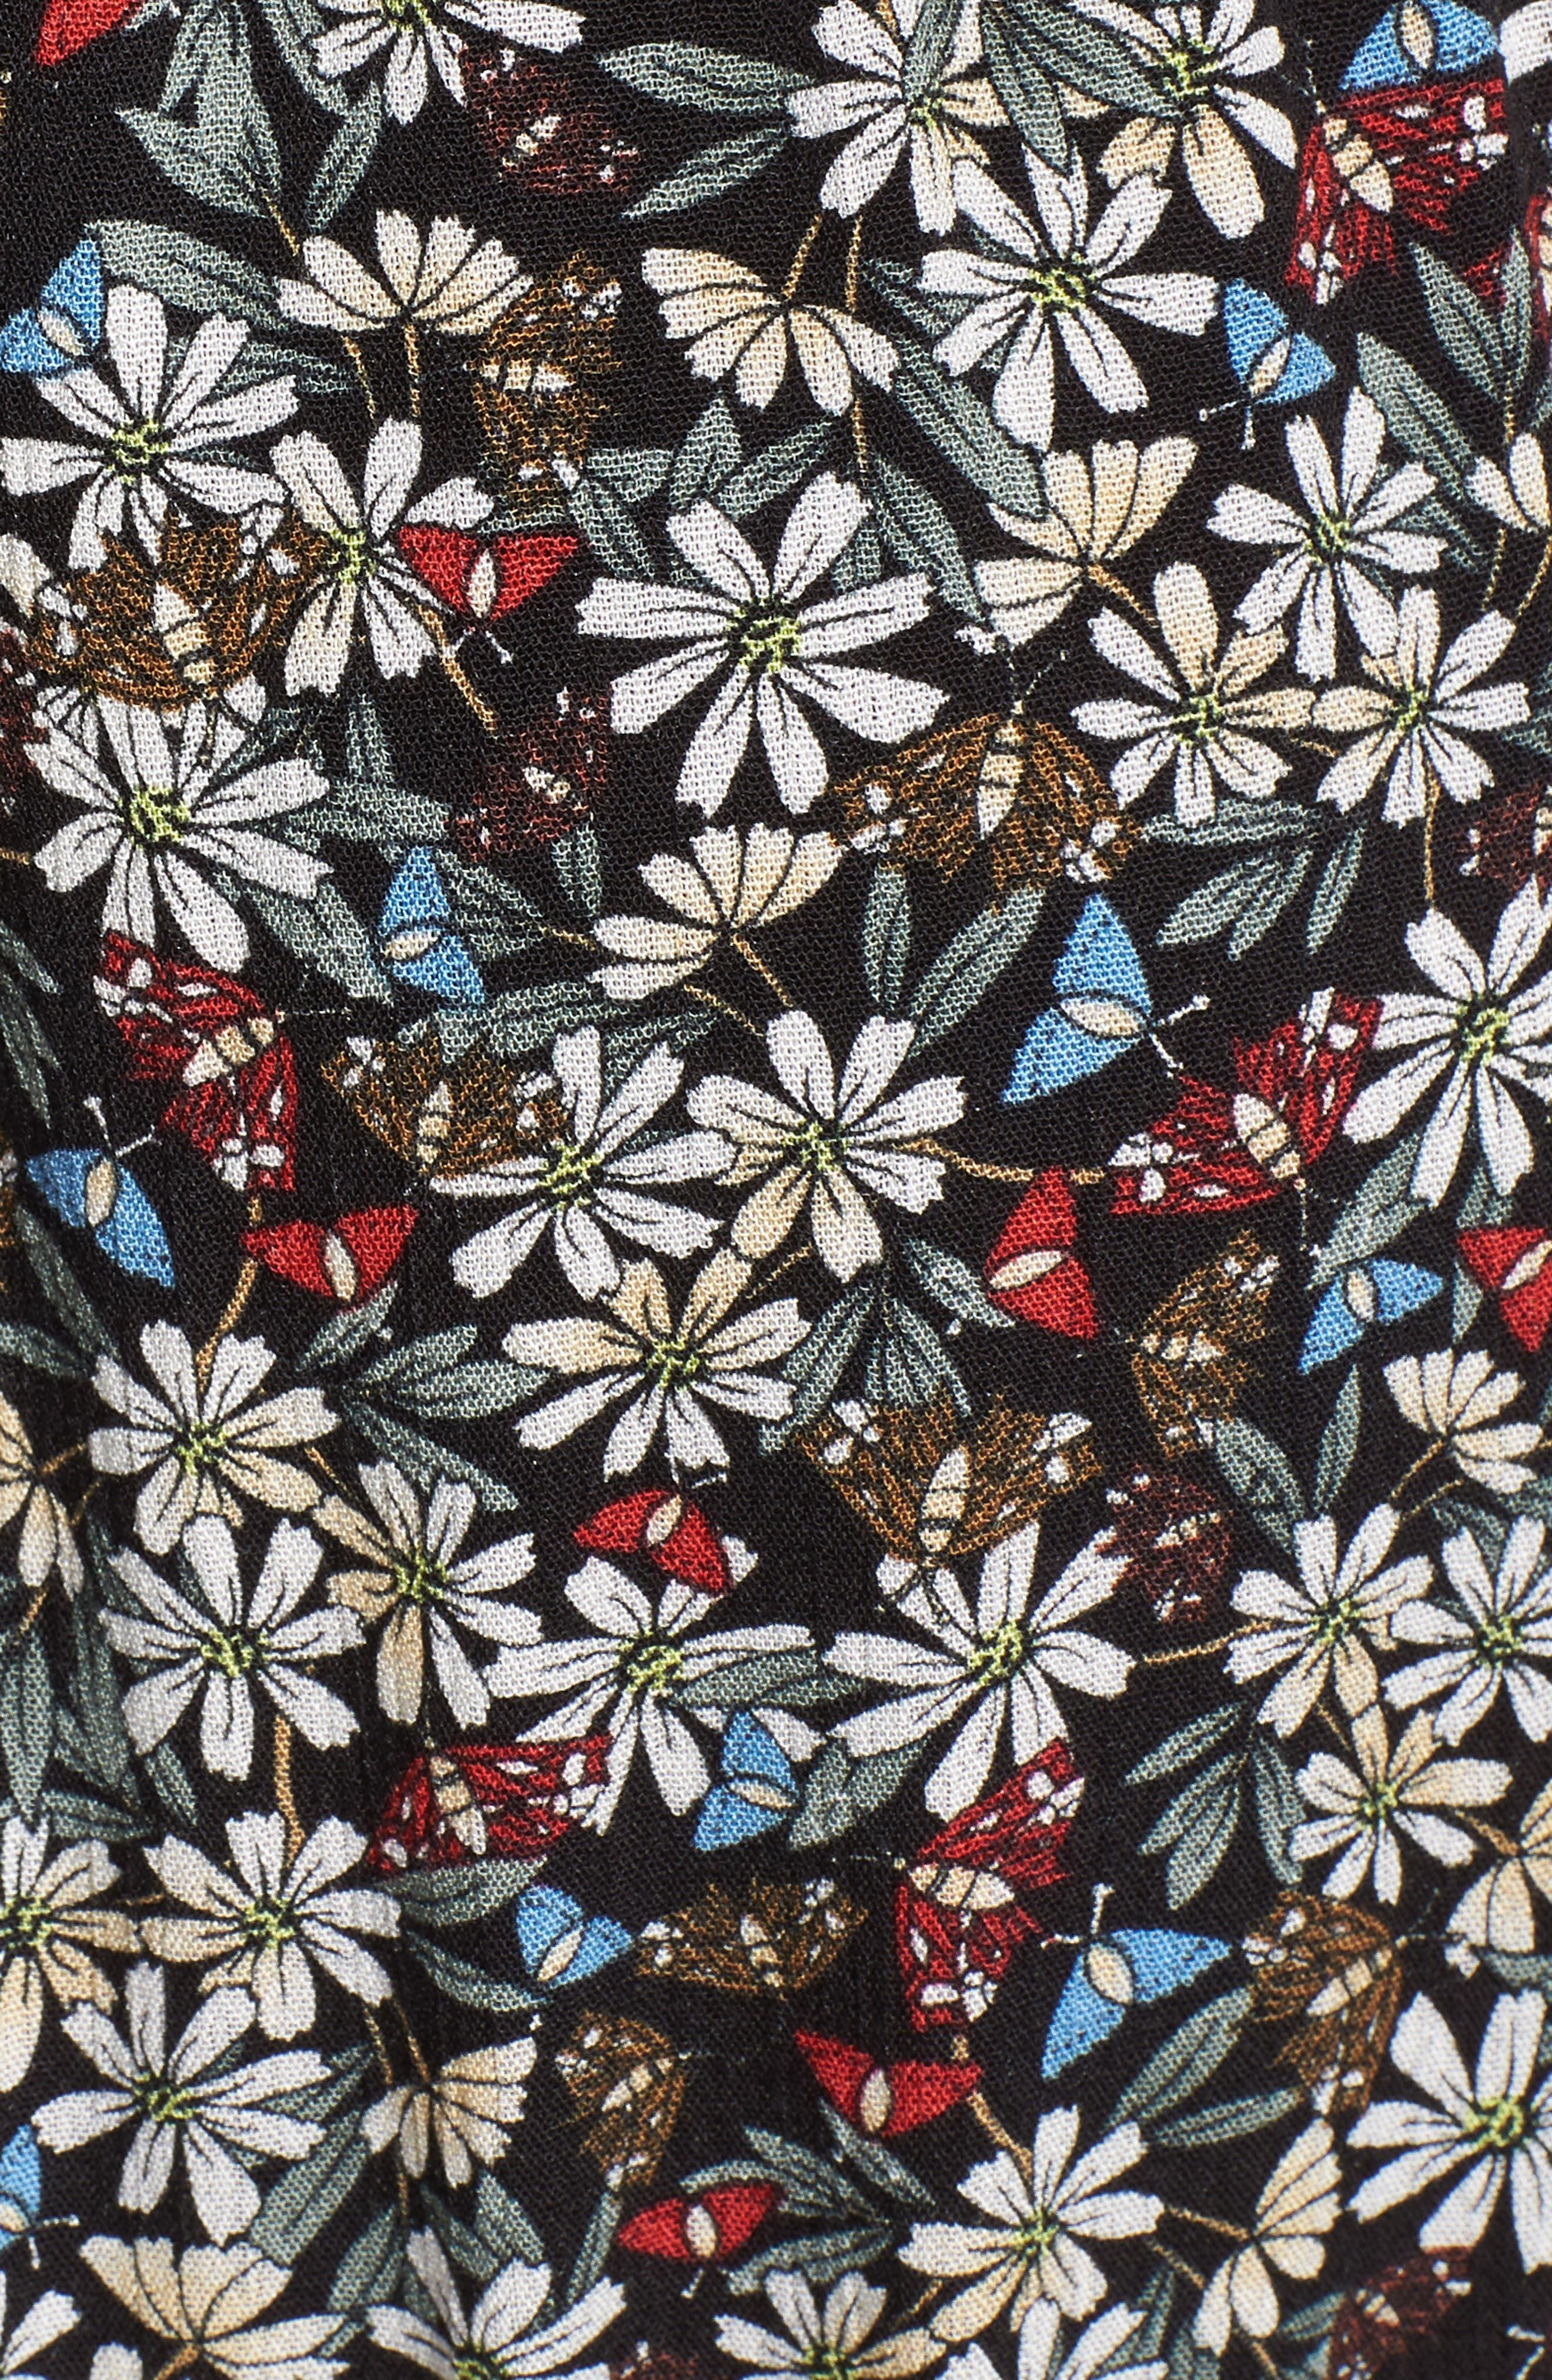 Flora Halter Neck Maxi Dress,                             Alternate thumbnail 5, color,                             004